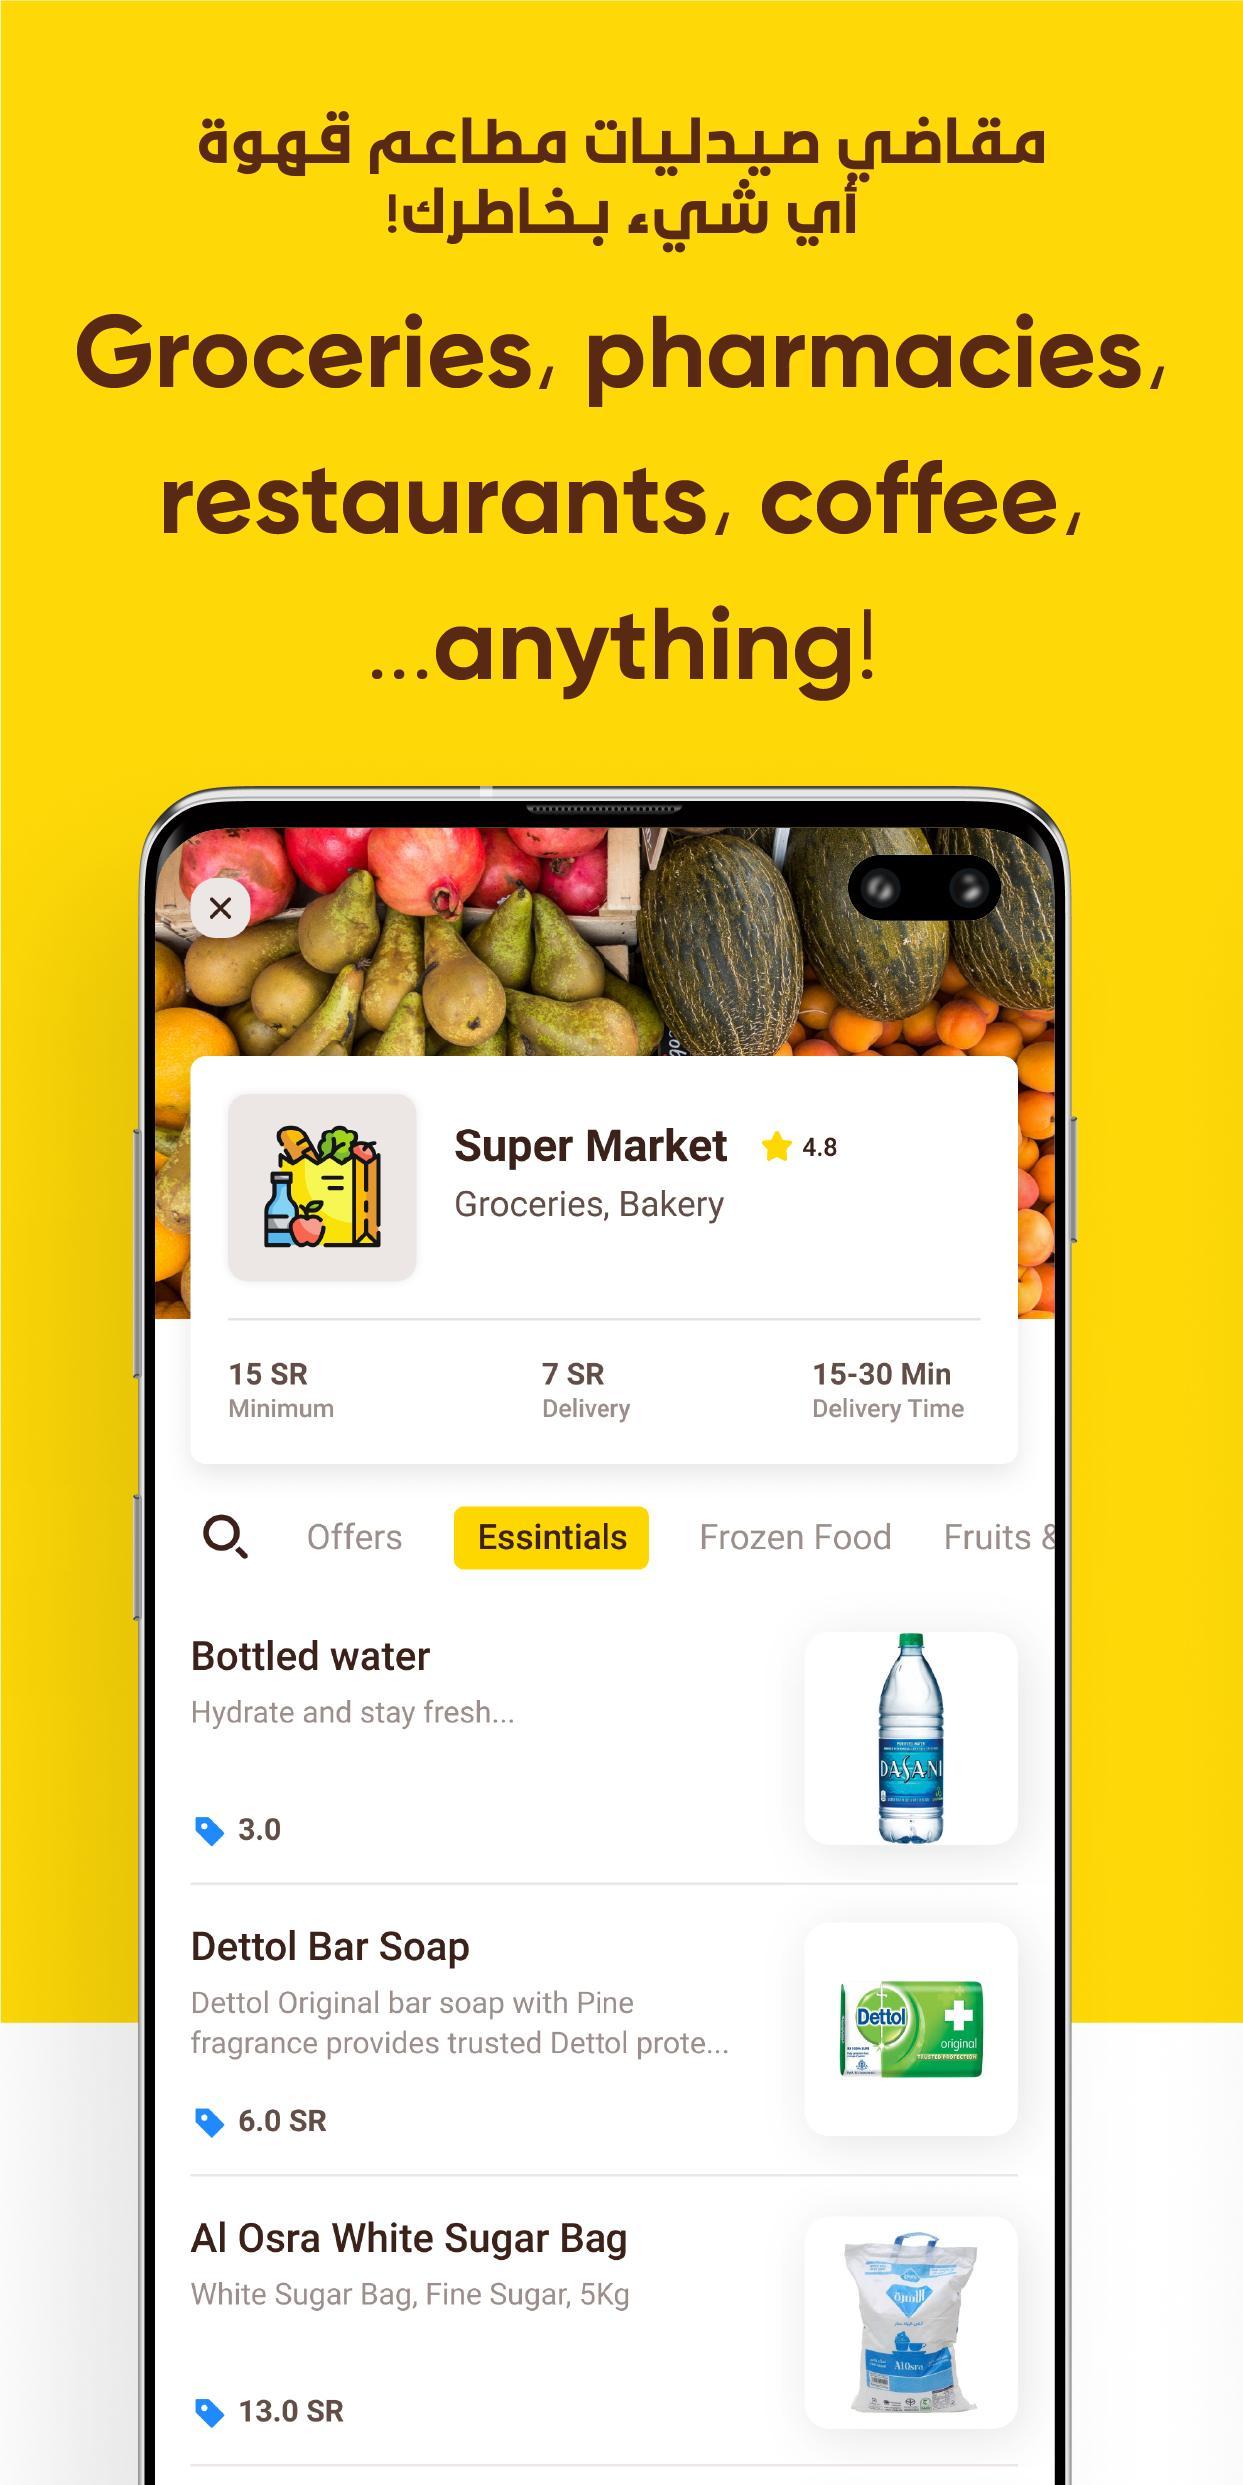 HungerStation Food, Groceries Delivery & More 8.0.1 Screenshot 3